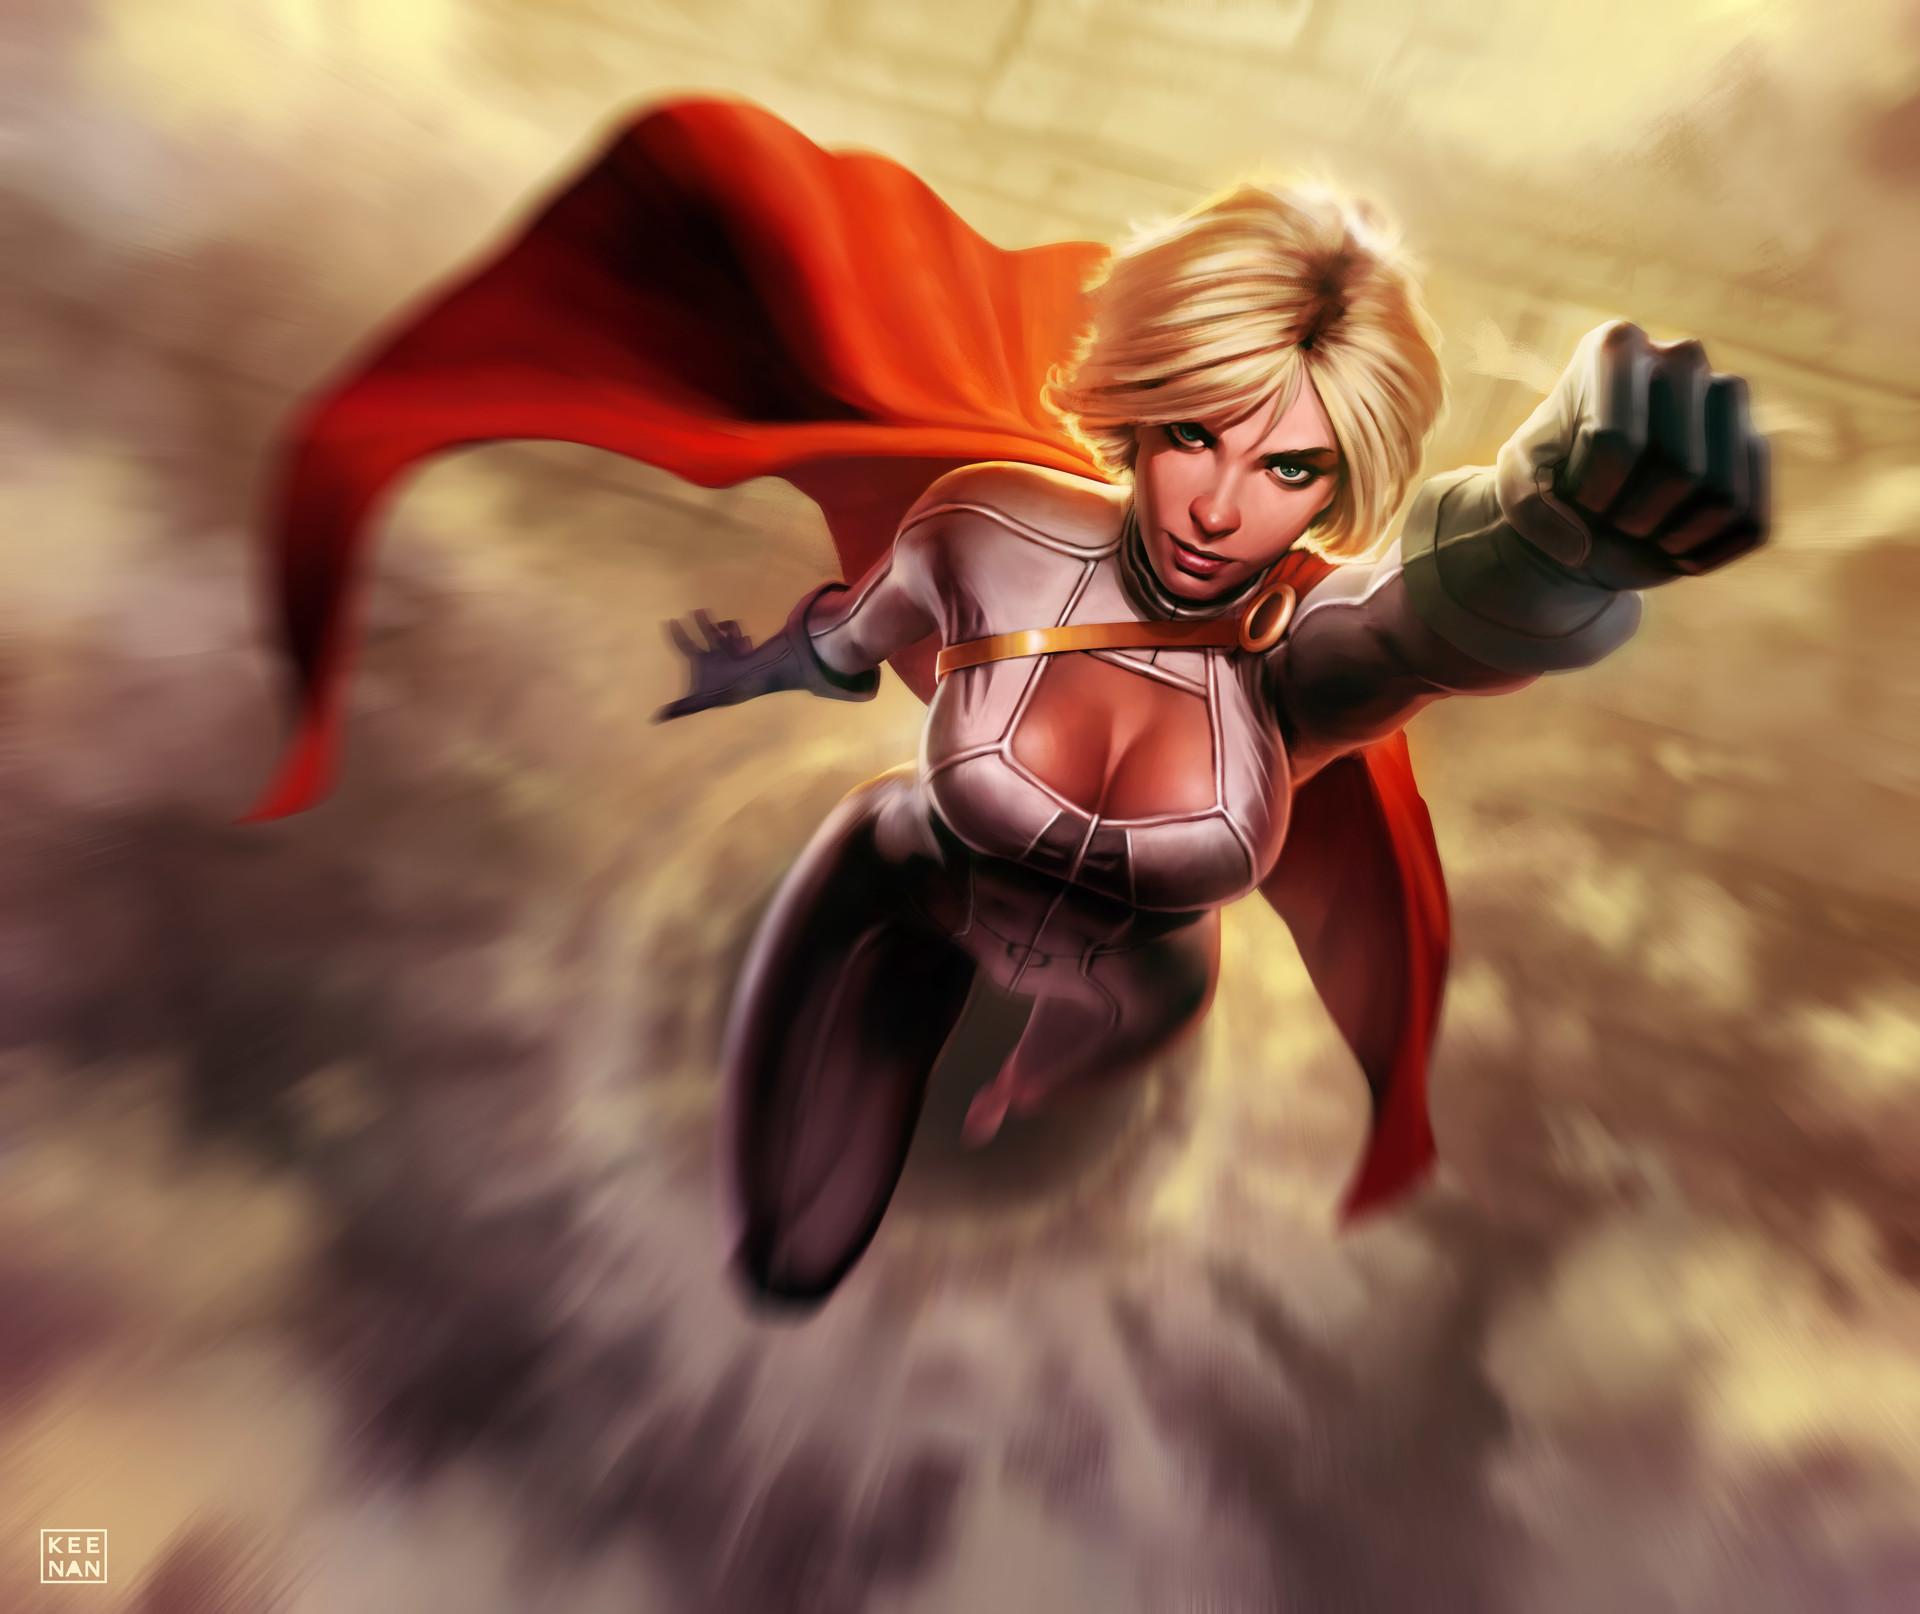 power girl artwork, hd superheroes, 4k wallpapers, images